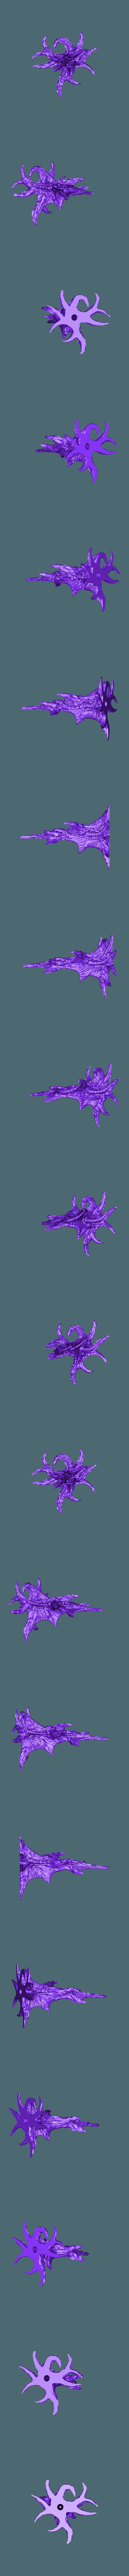 "WebTree04.stl Download free STL file Tabletop plant: ""Webbing Tree"" (Alien Vegetation 17) • 3D print template, GrimGreeble"